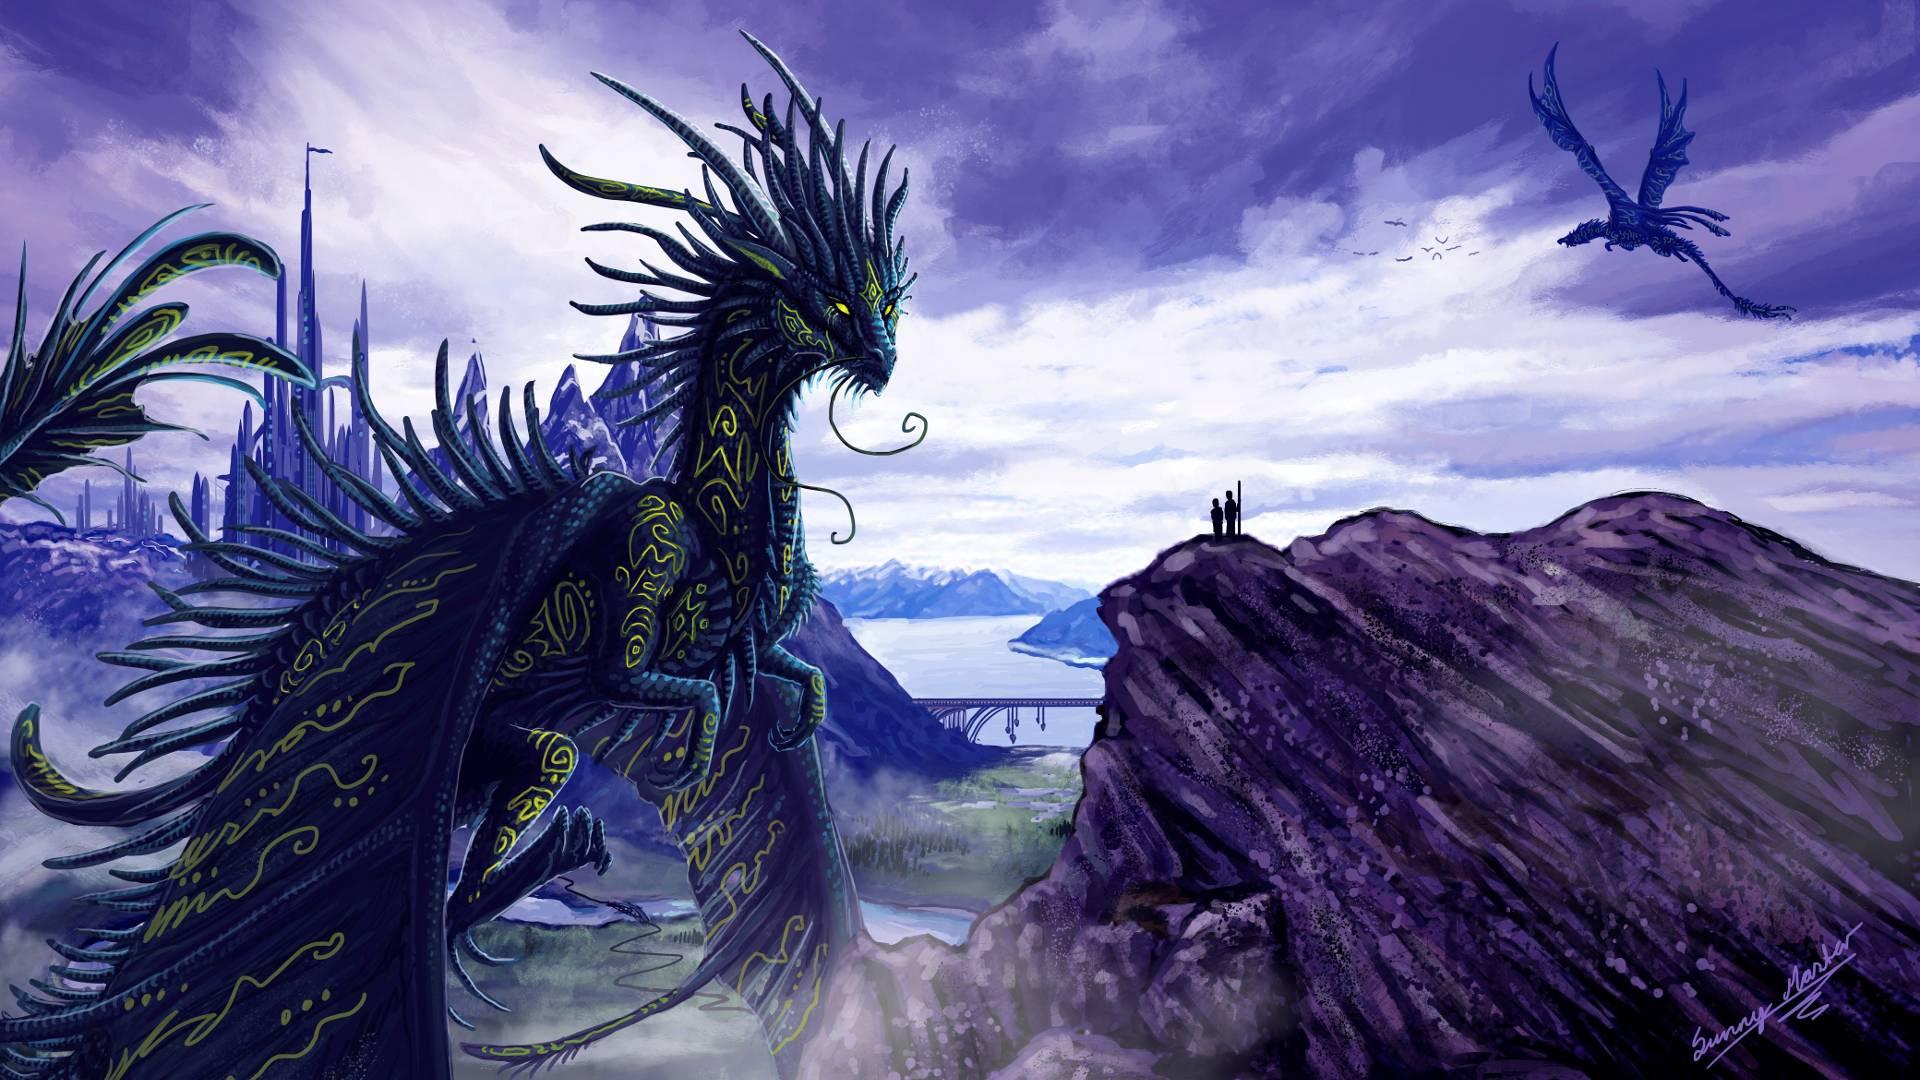 Purple Dragon Wallpapers Top Free Purple Dragon Backgrounds Wallpaperaccess